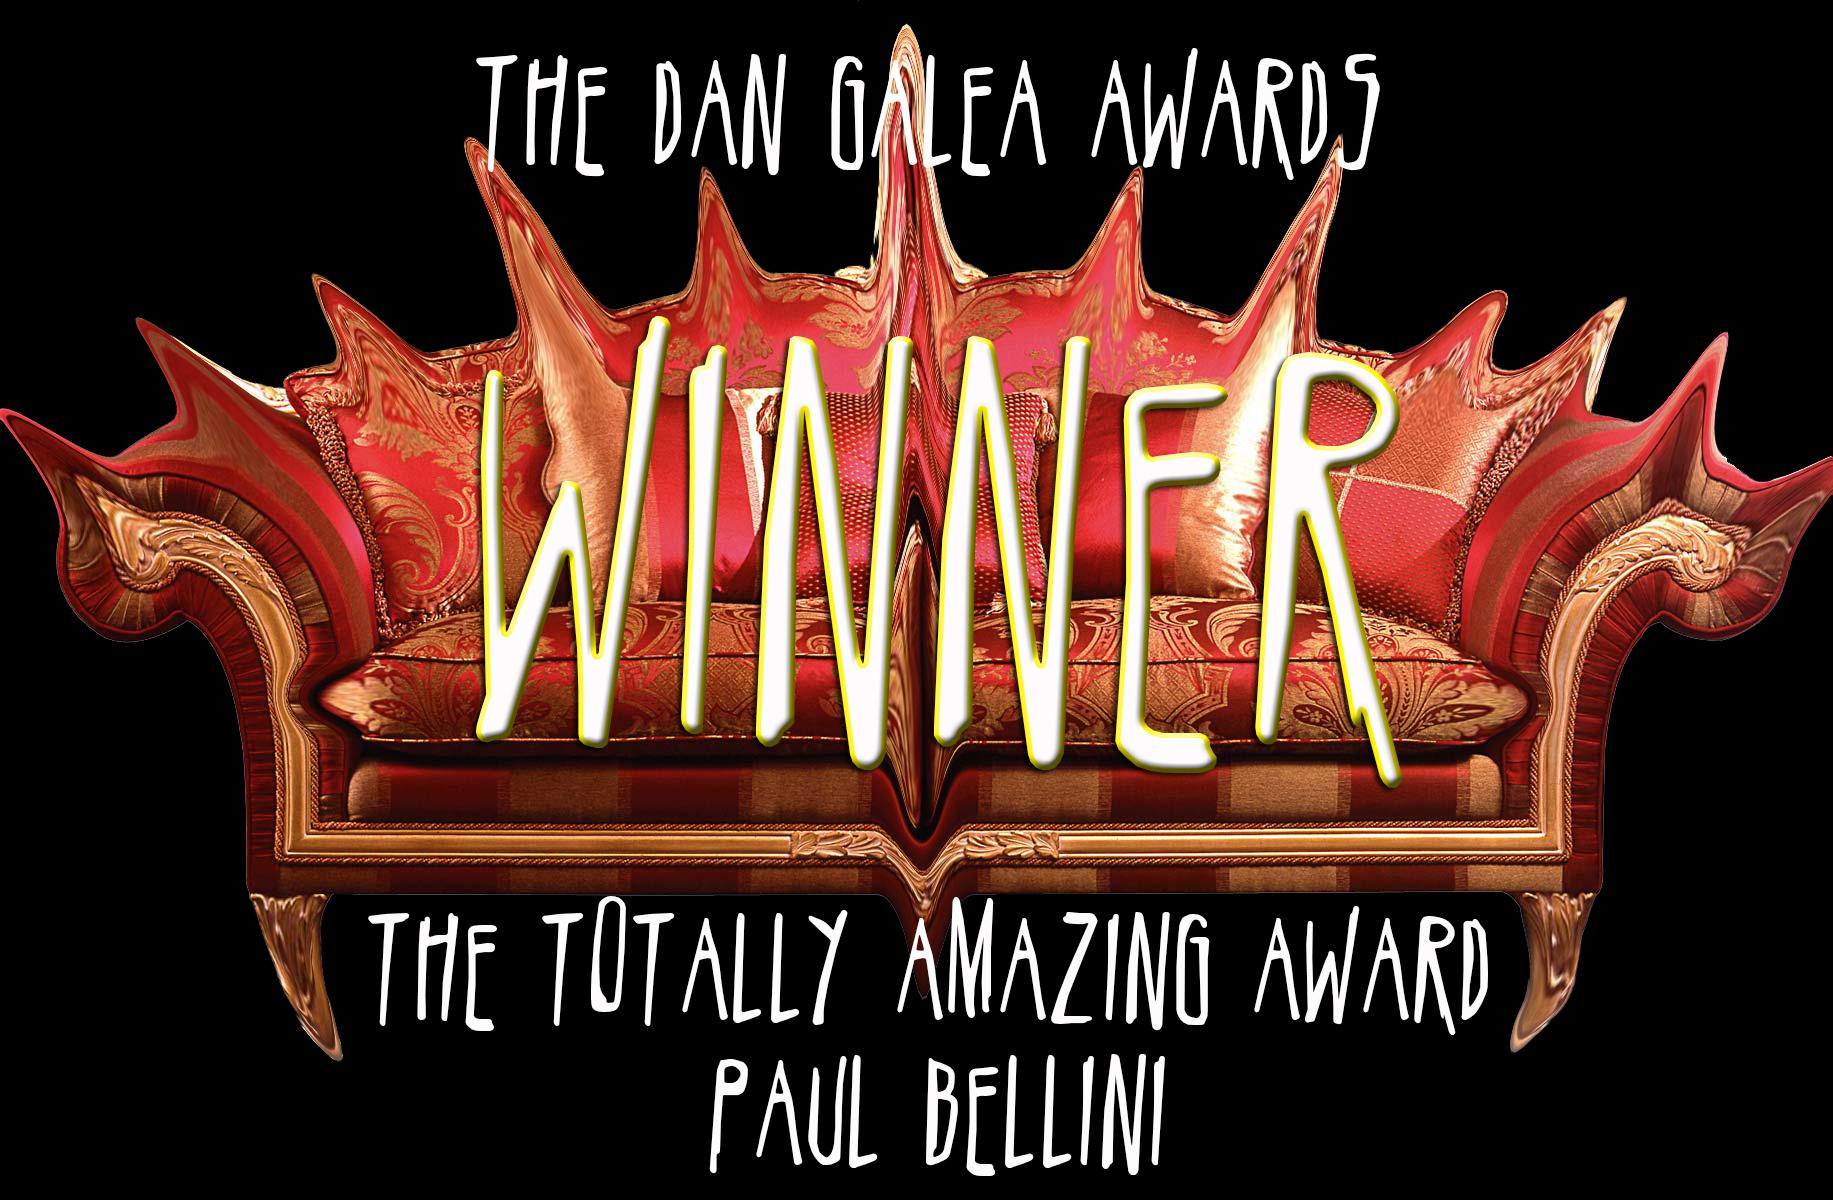 DGawards PaulBellini.jpg